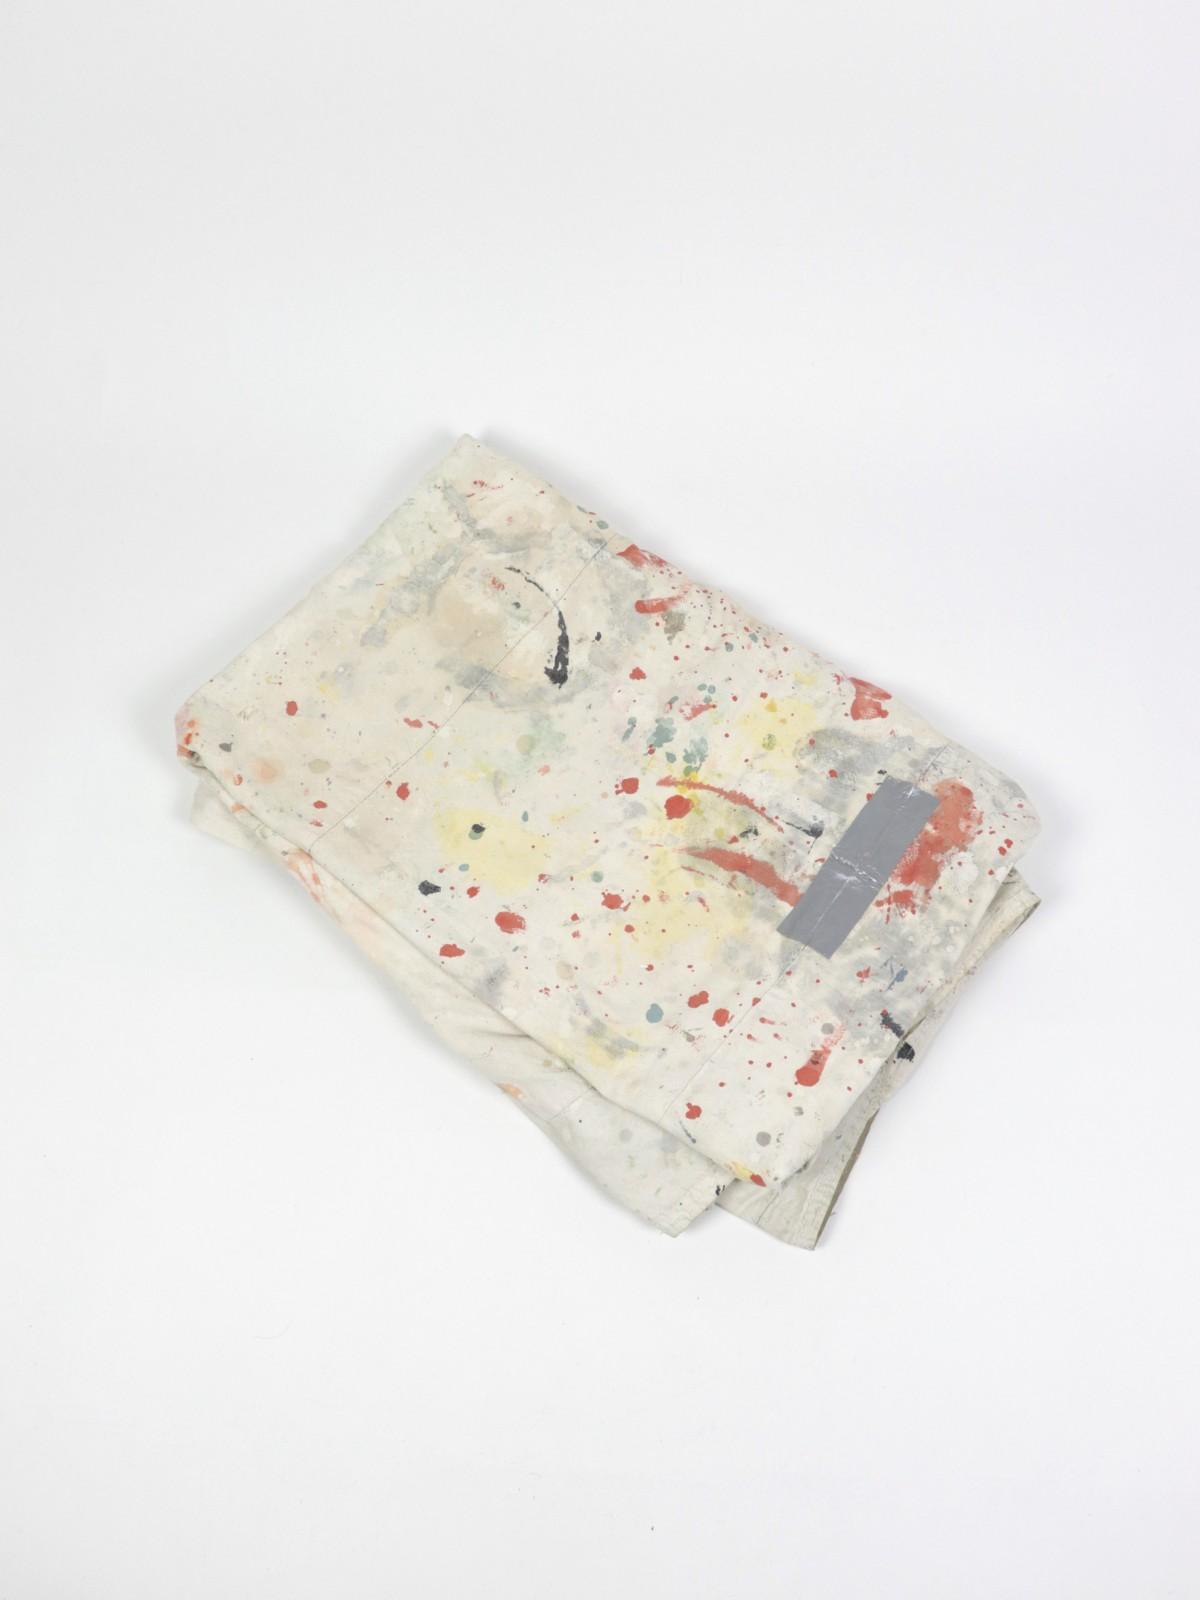 paint fabric, USA